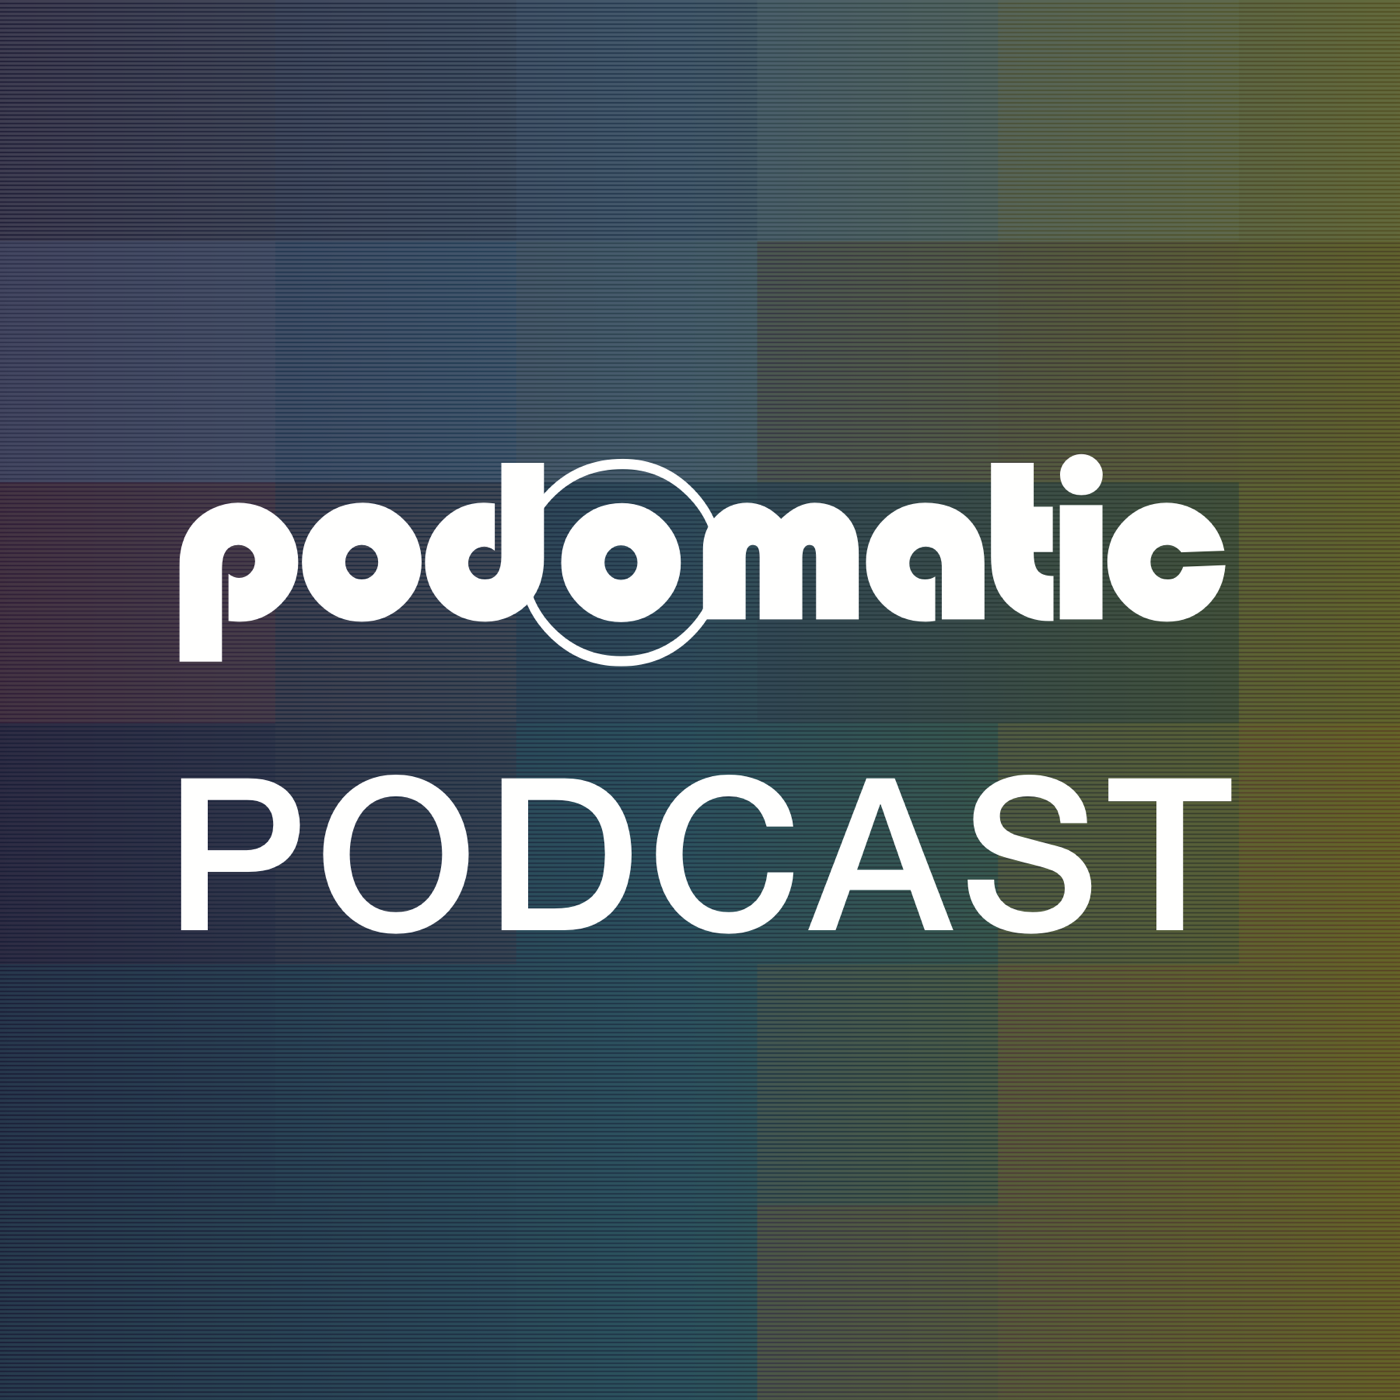 theNCG's Podcast